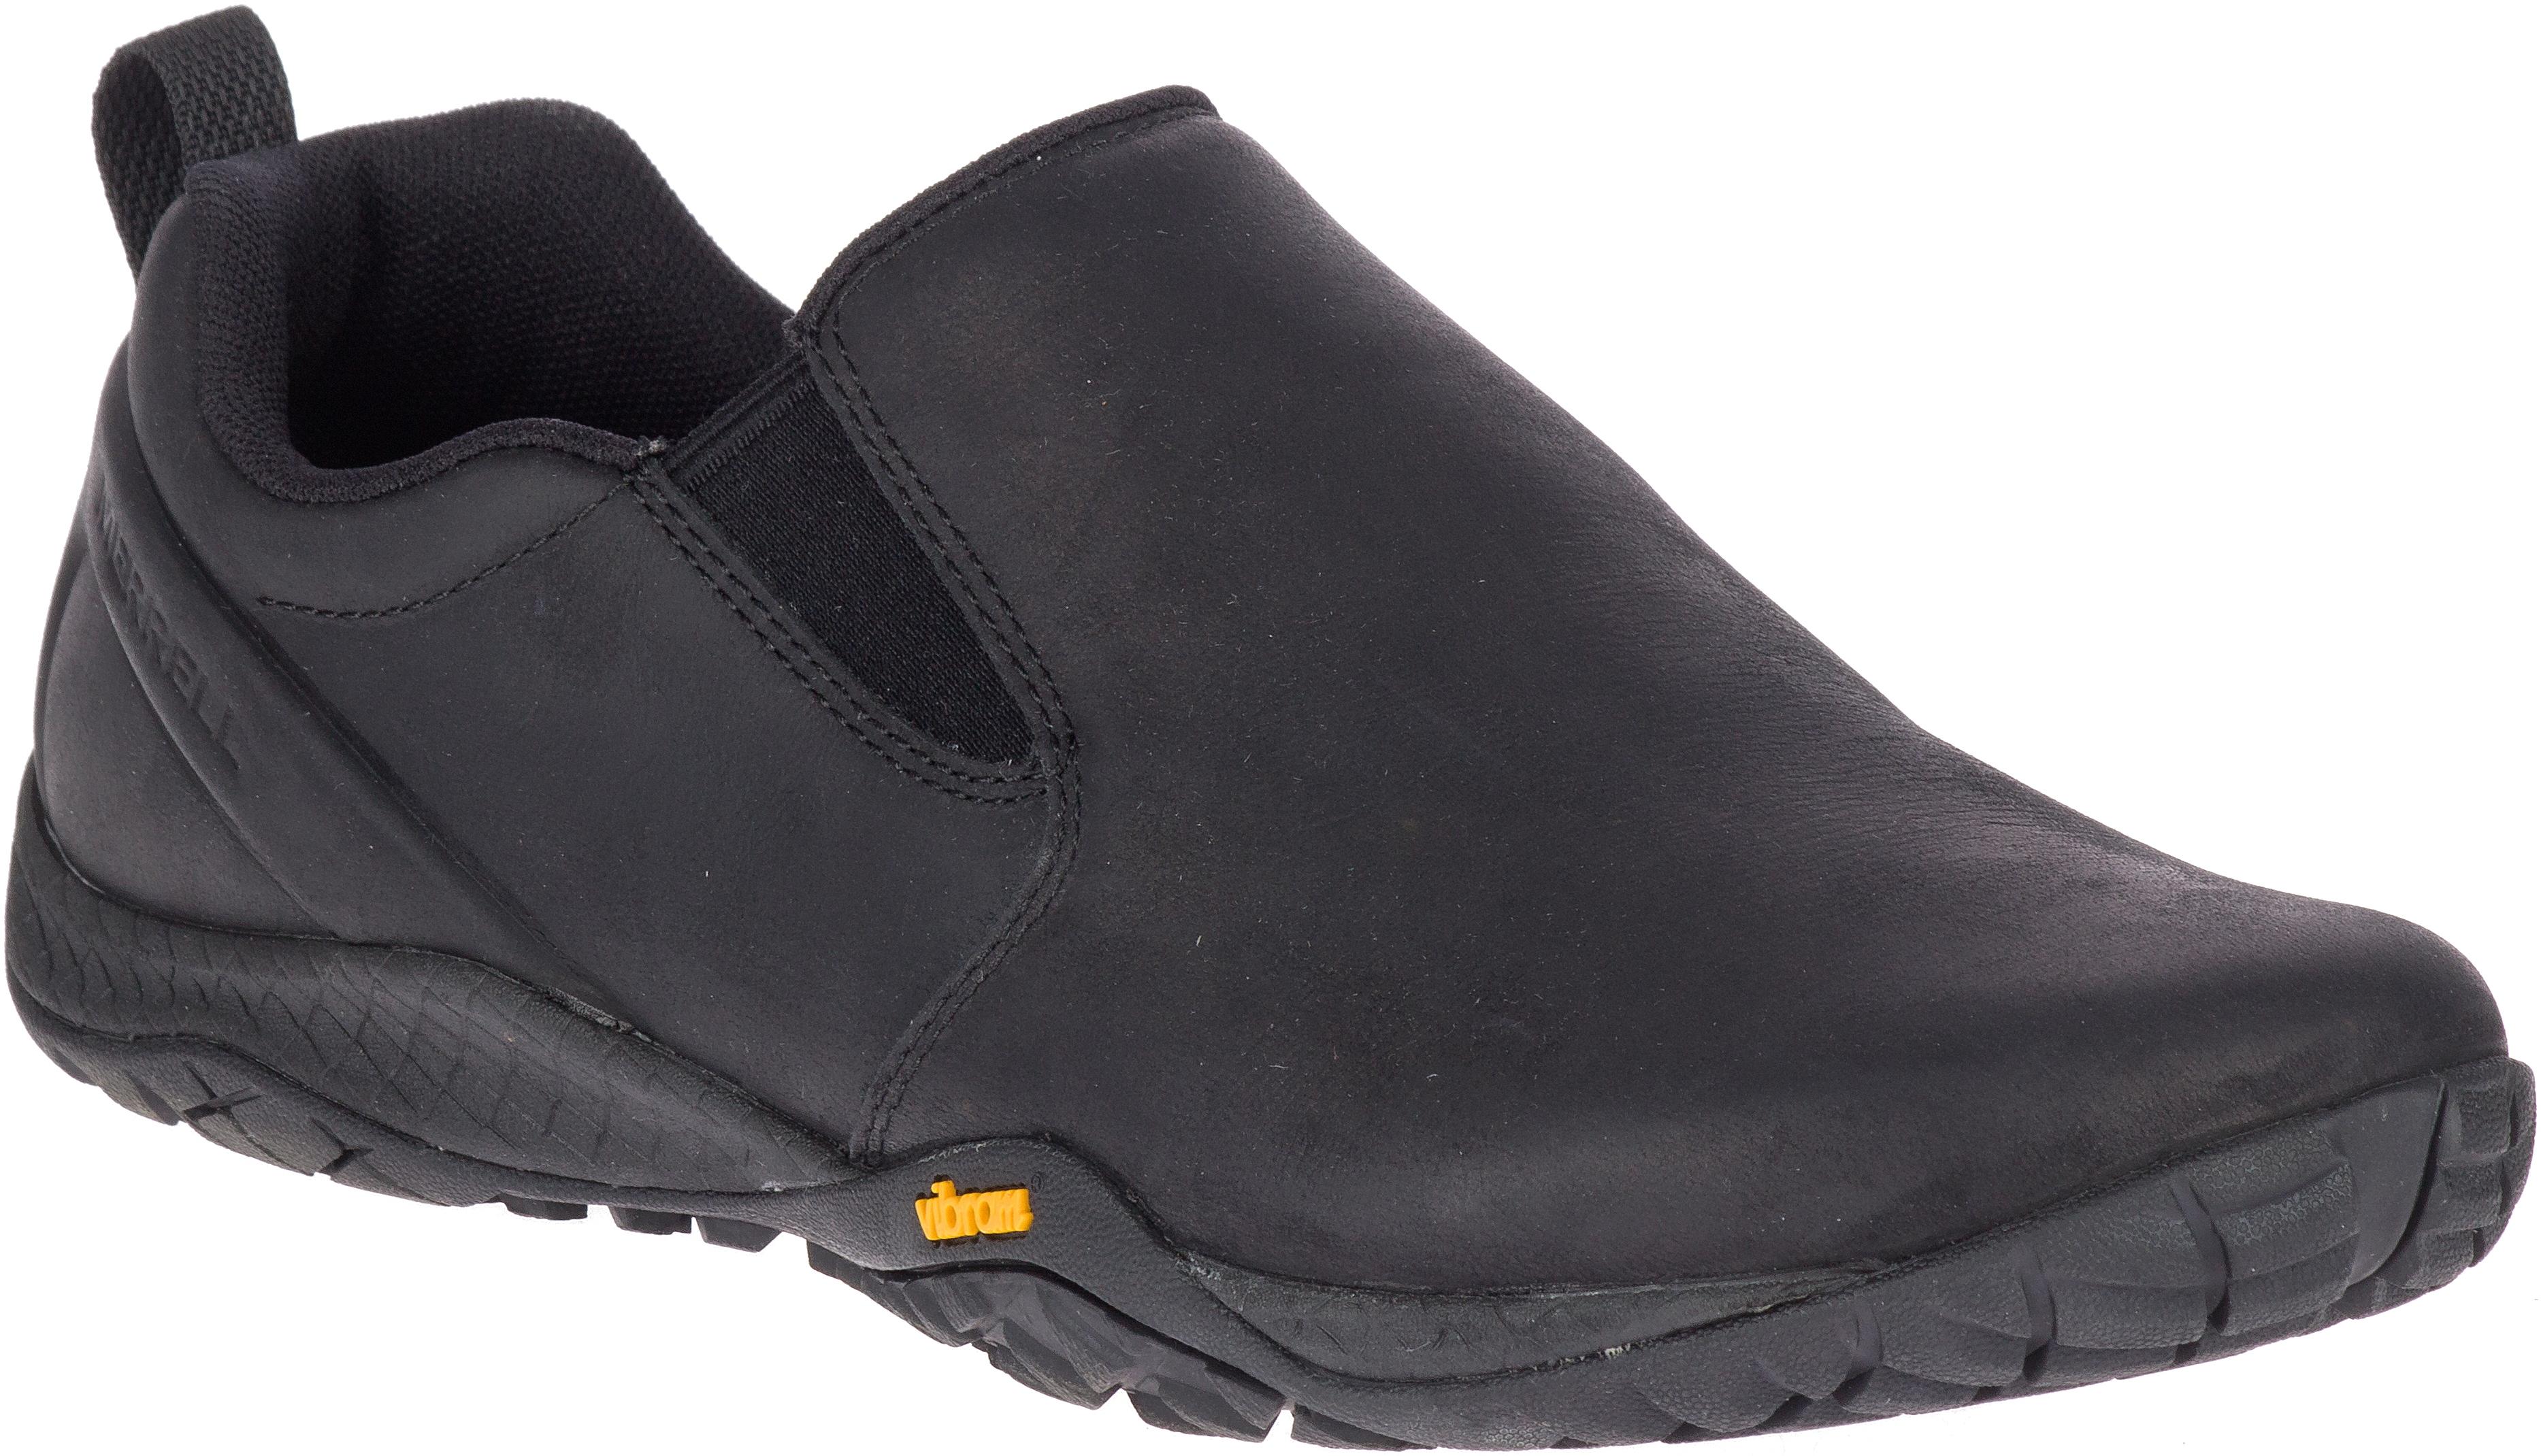 Trail Glove 4 Luna Slip On, Black